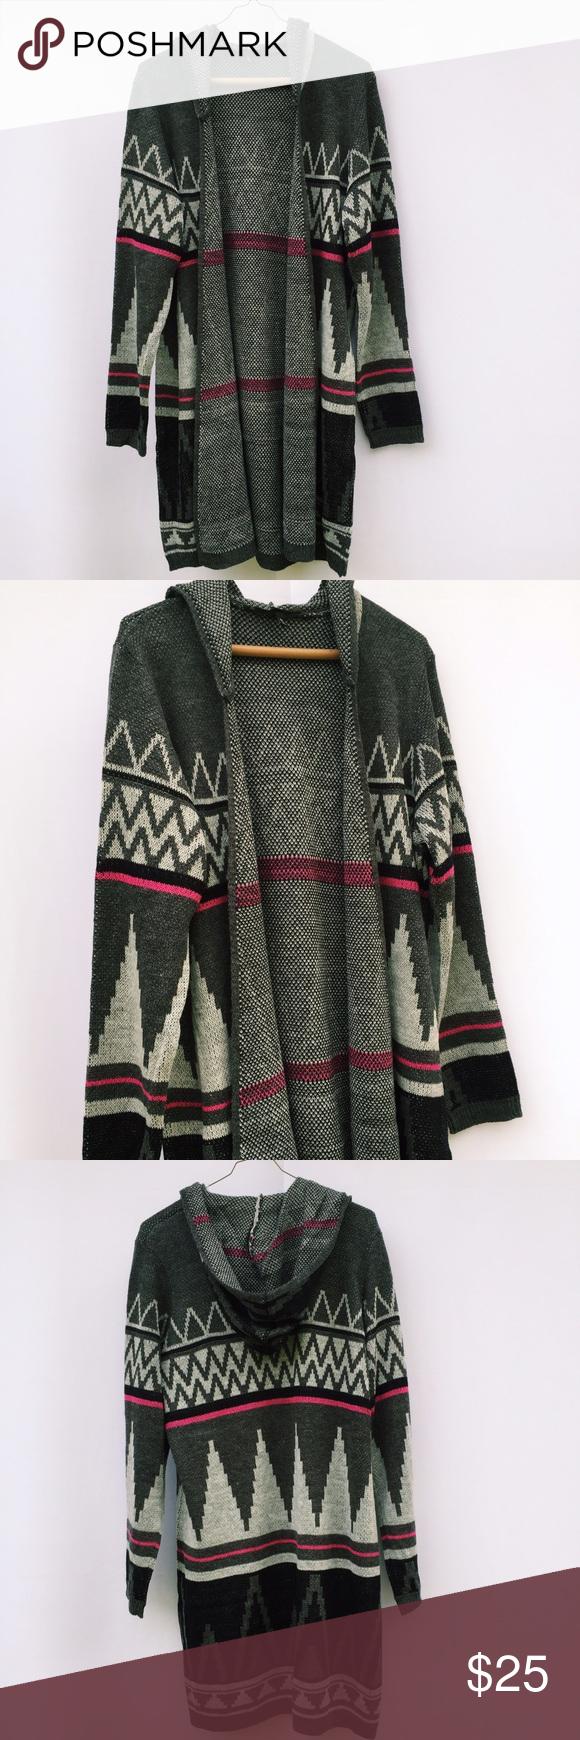 Grey aztec design hooded cardigan duster new lg Amazing gray pink ...